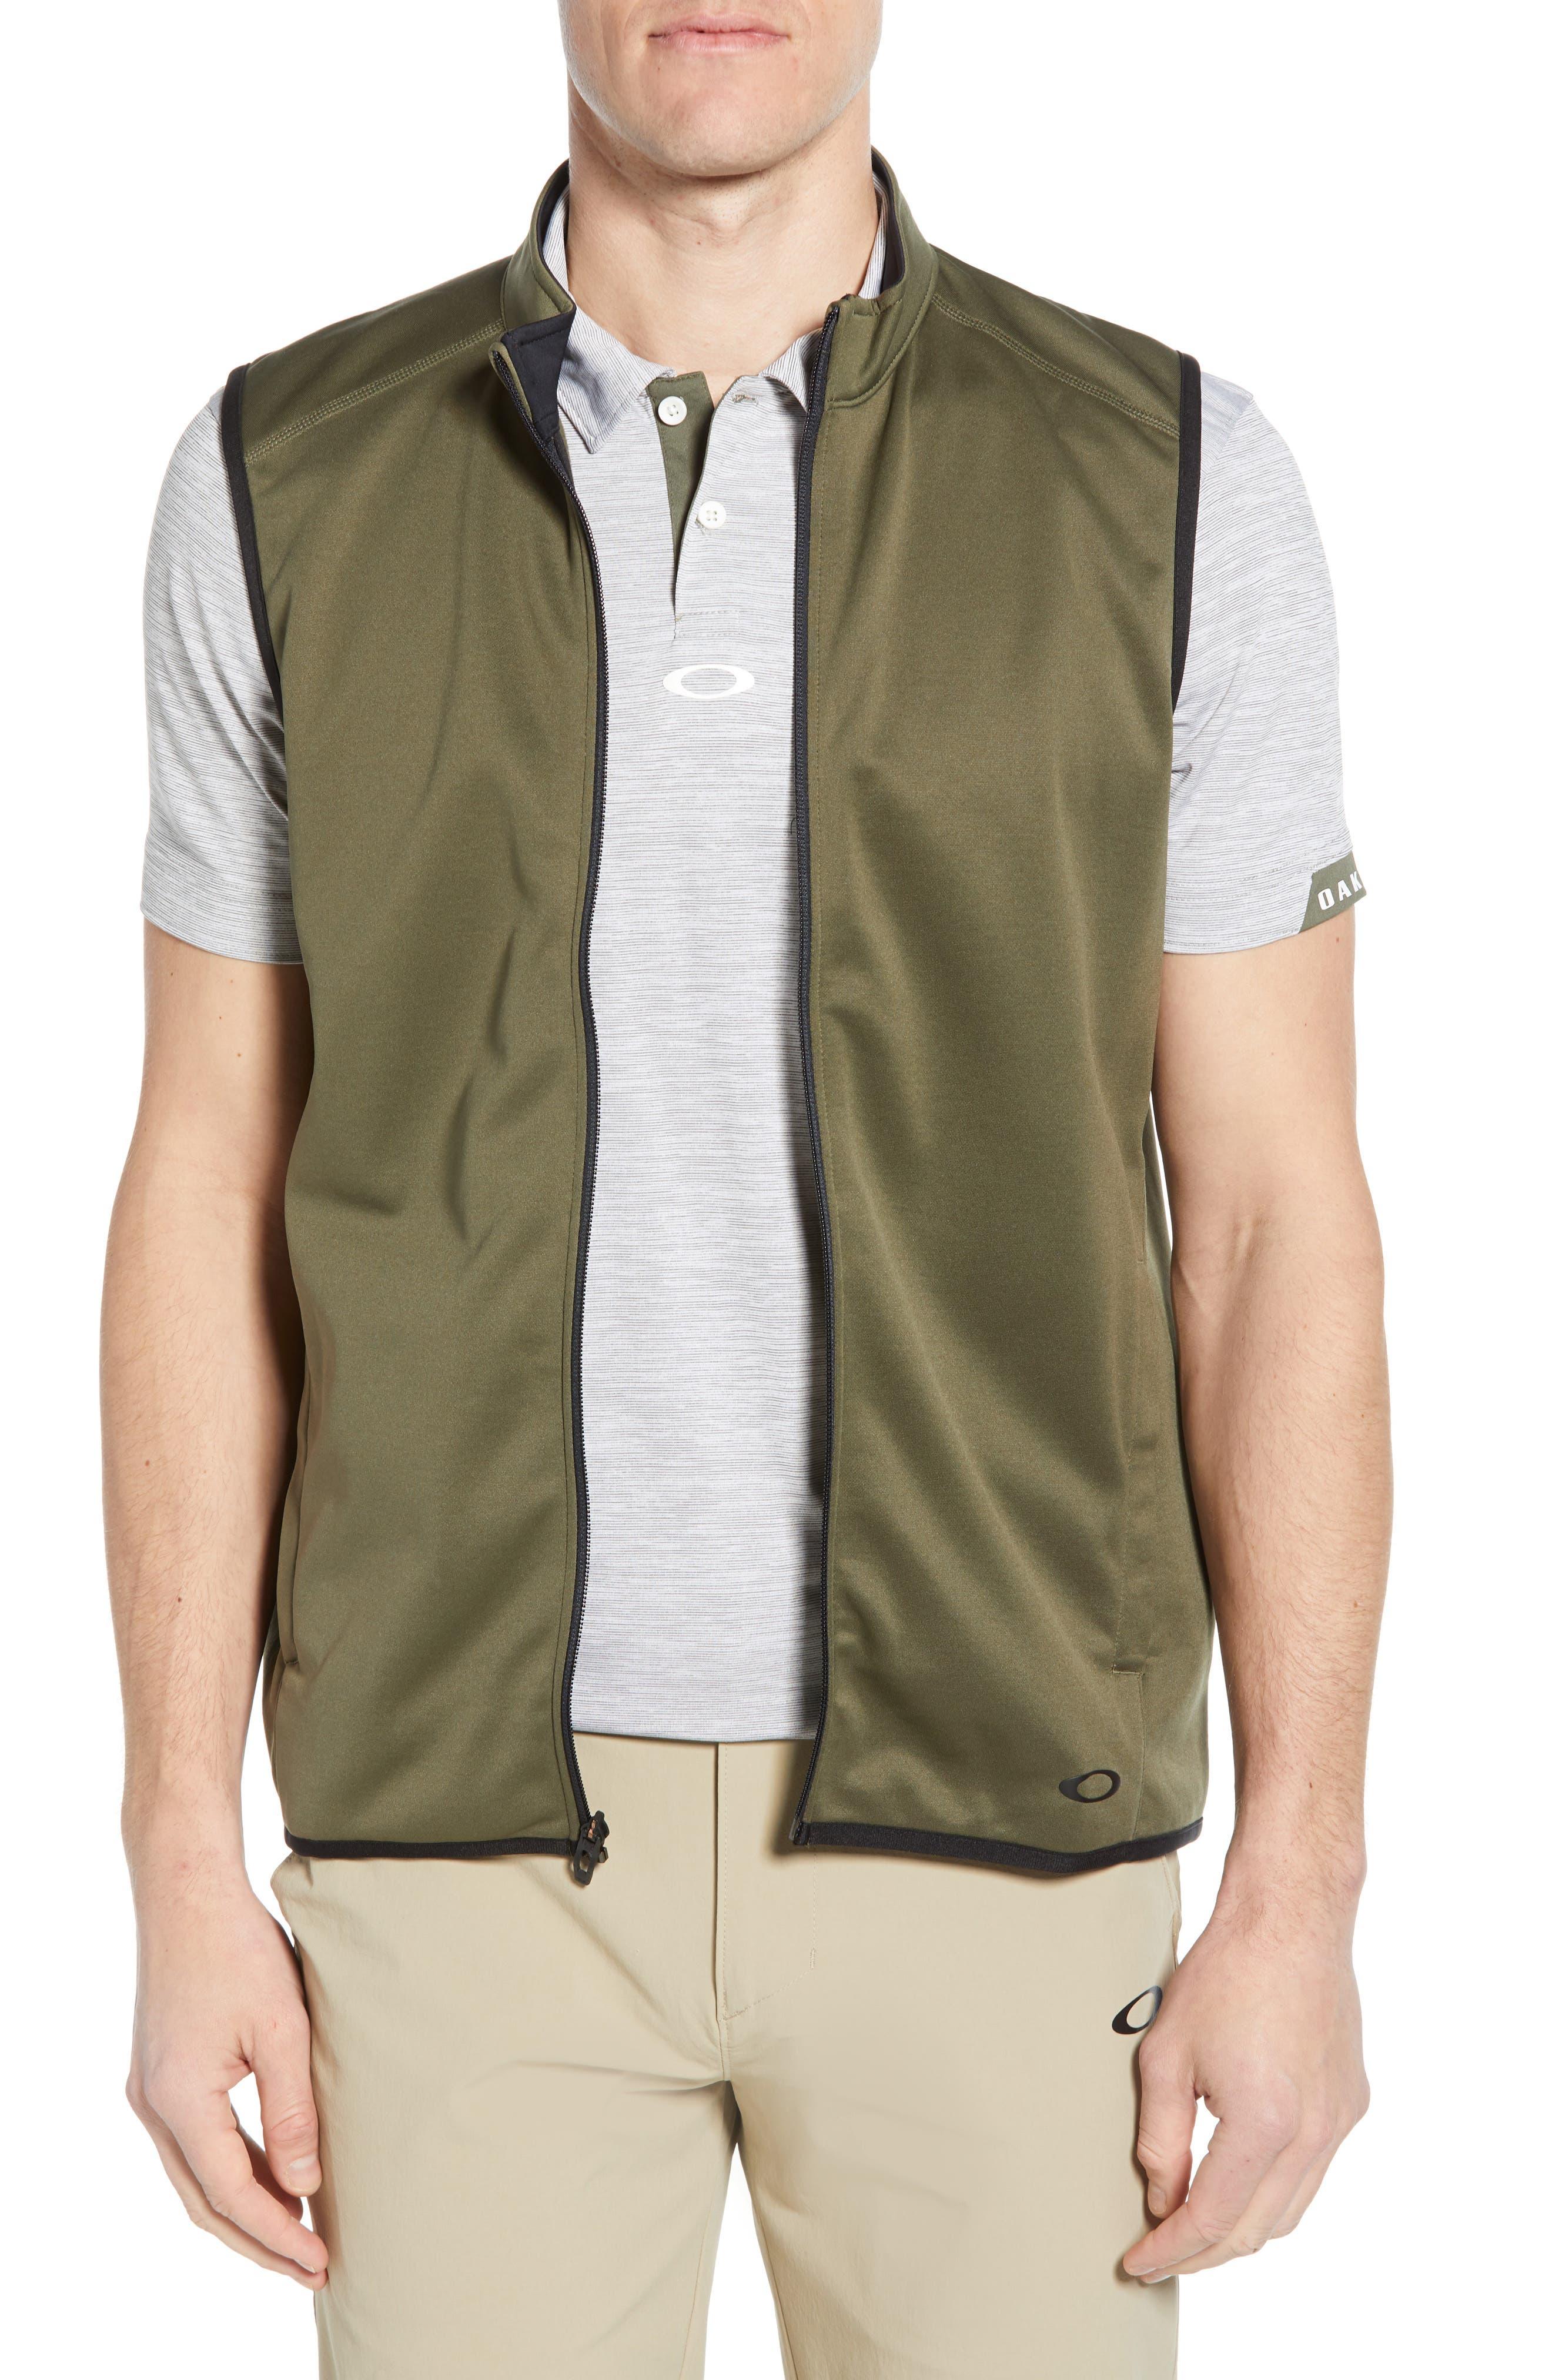 Image of Oakley Range Vest